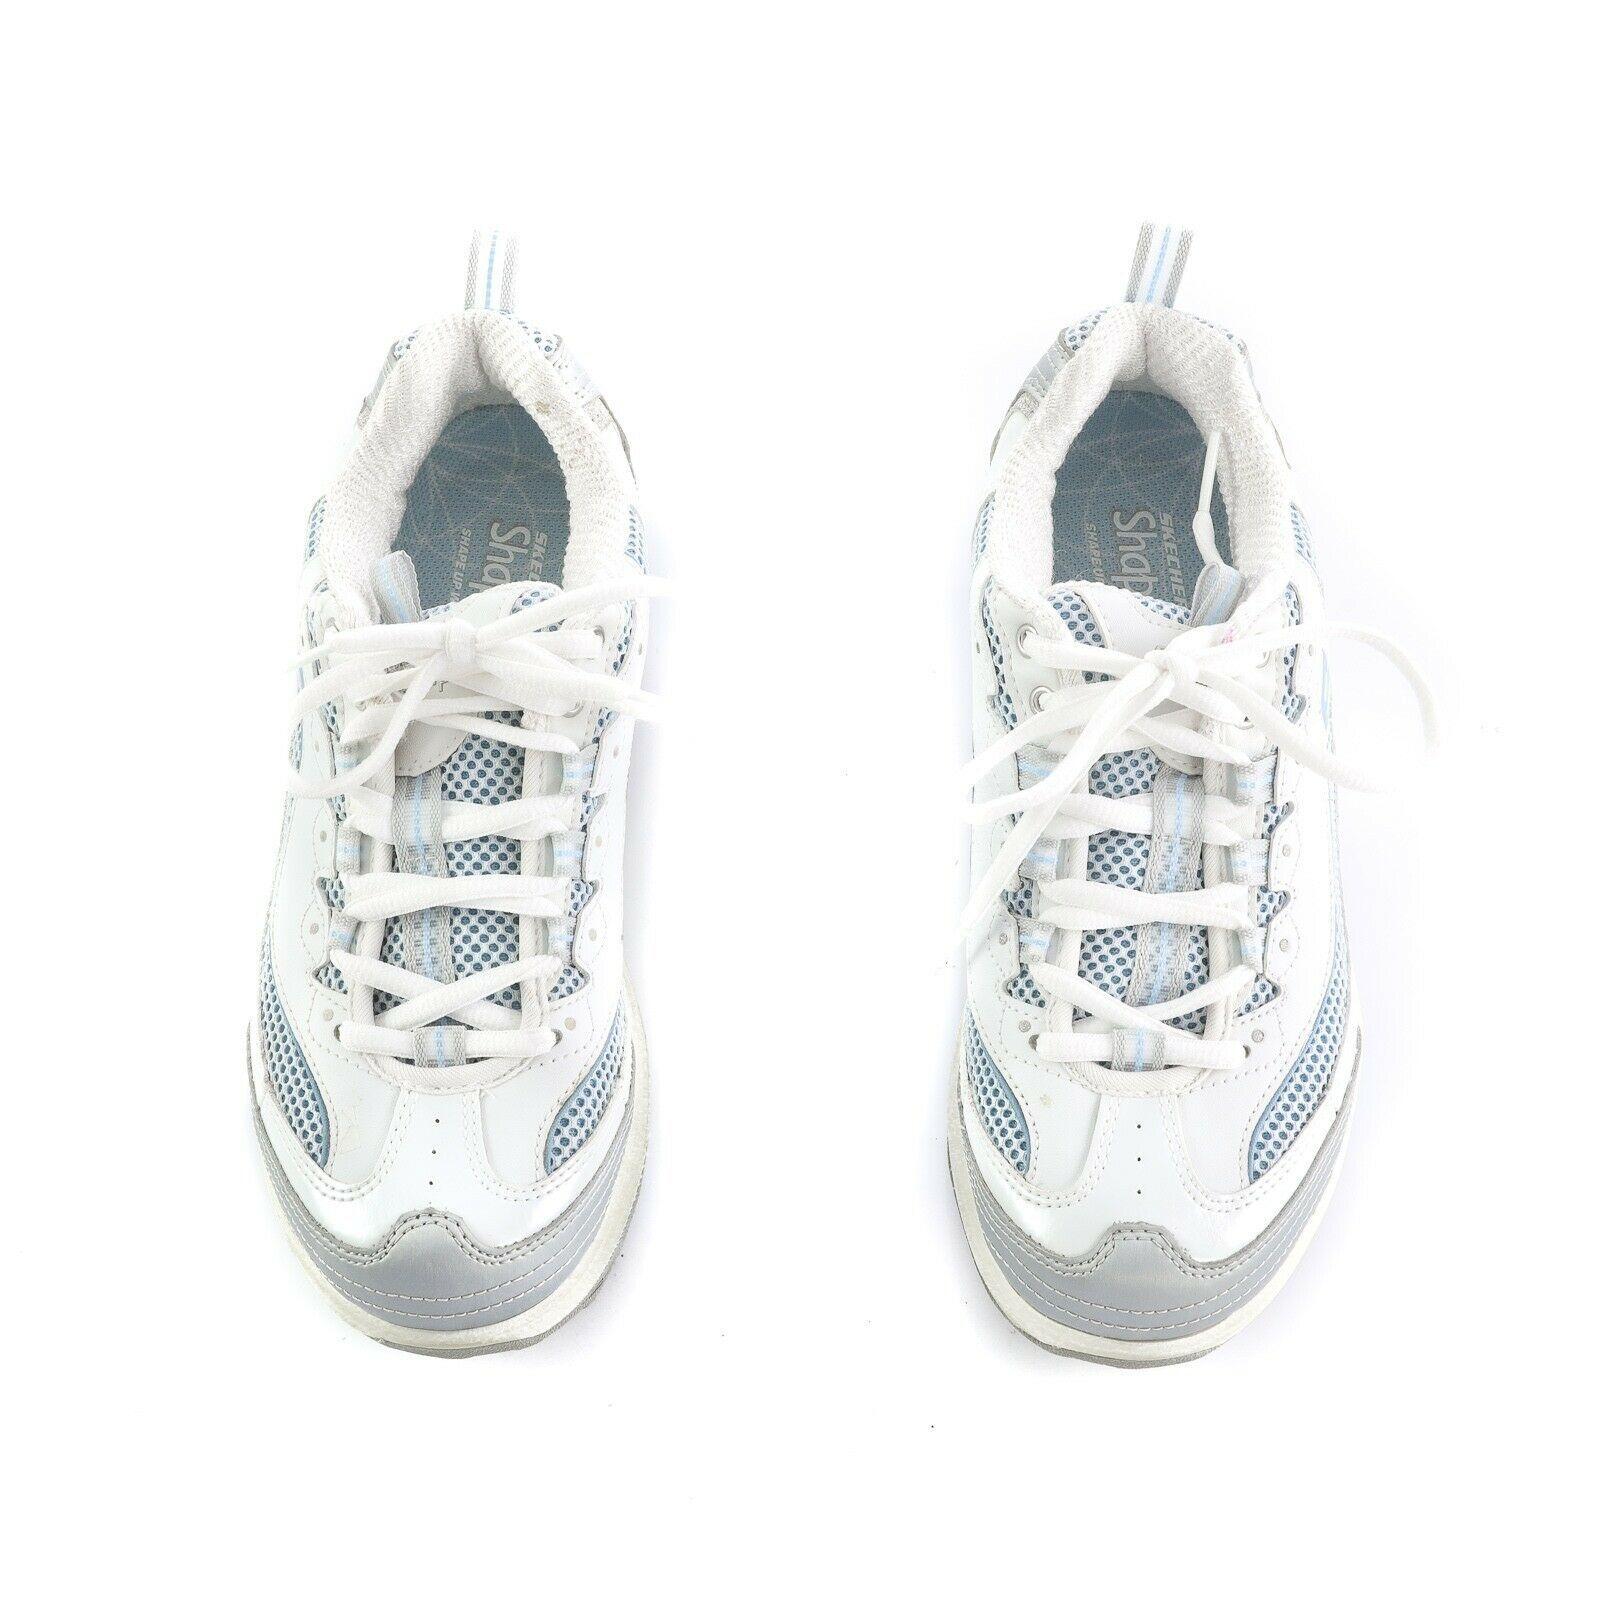 Skechers Shape Ups Women Walking Toning Sneakers Shoes White Silver Size 7 11803